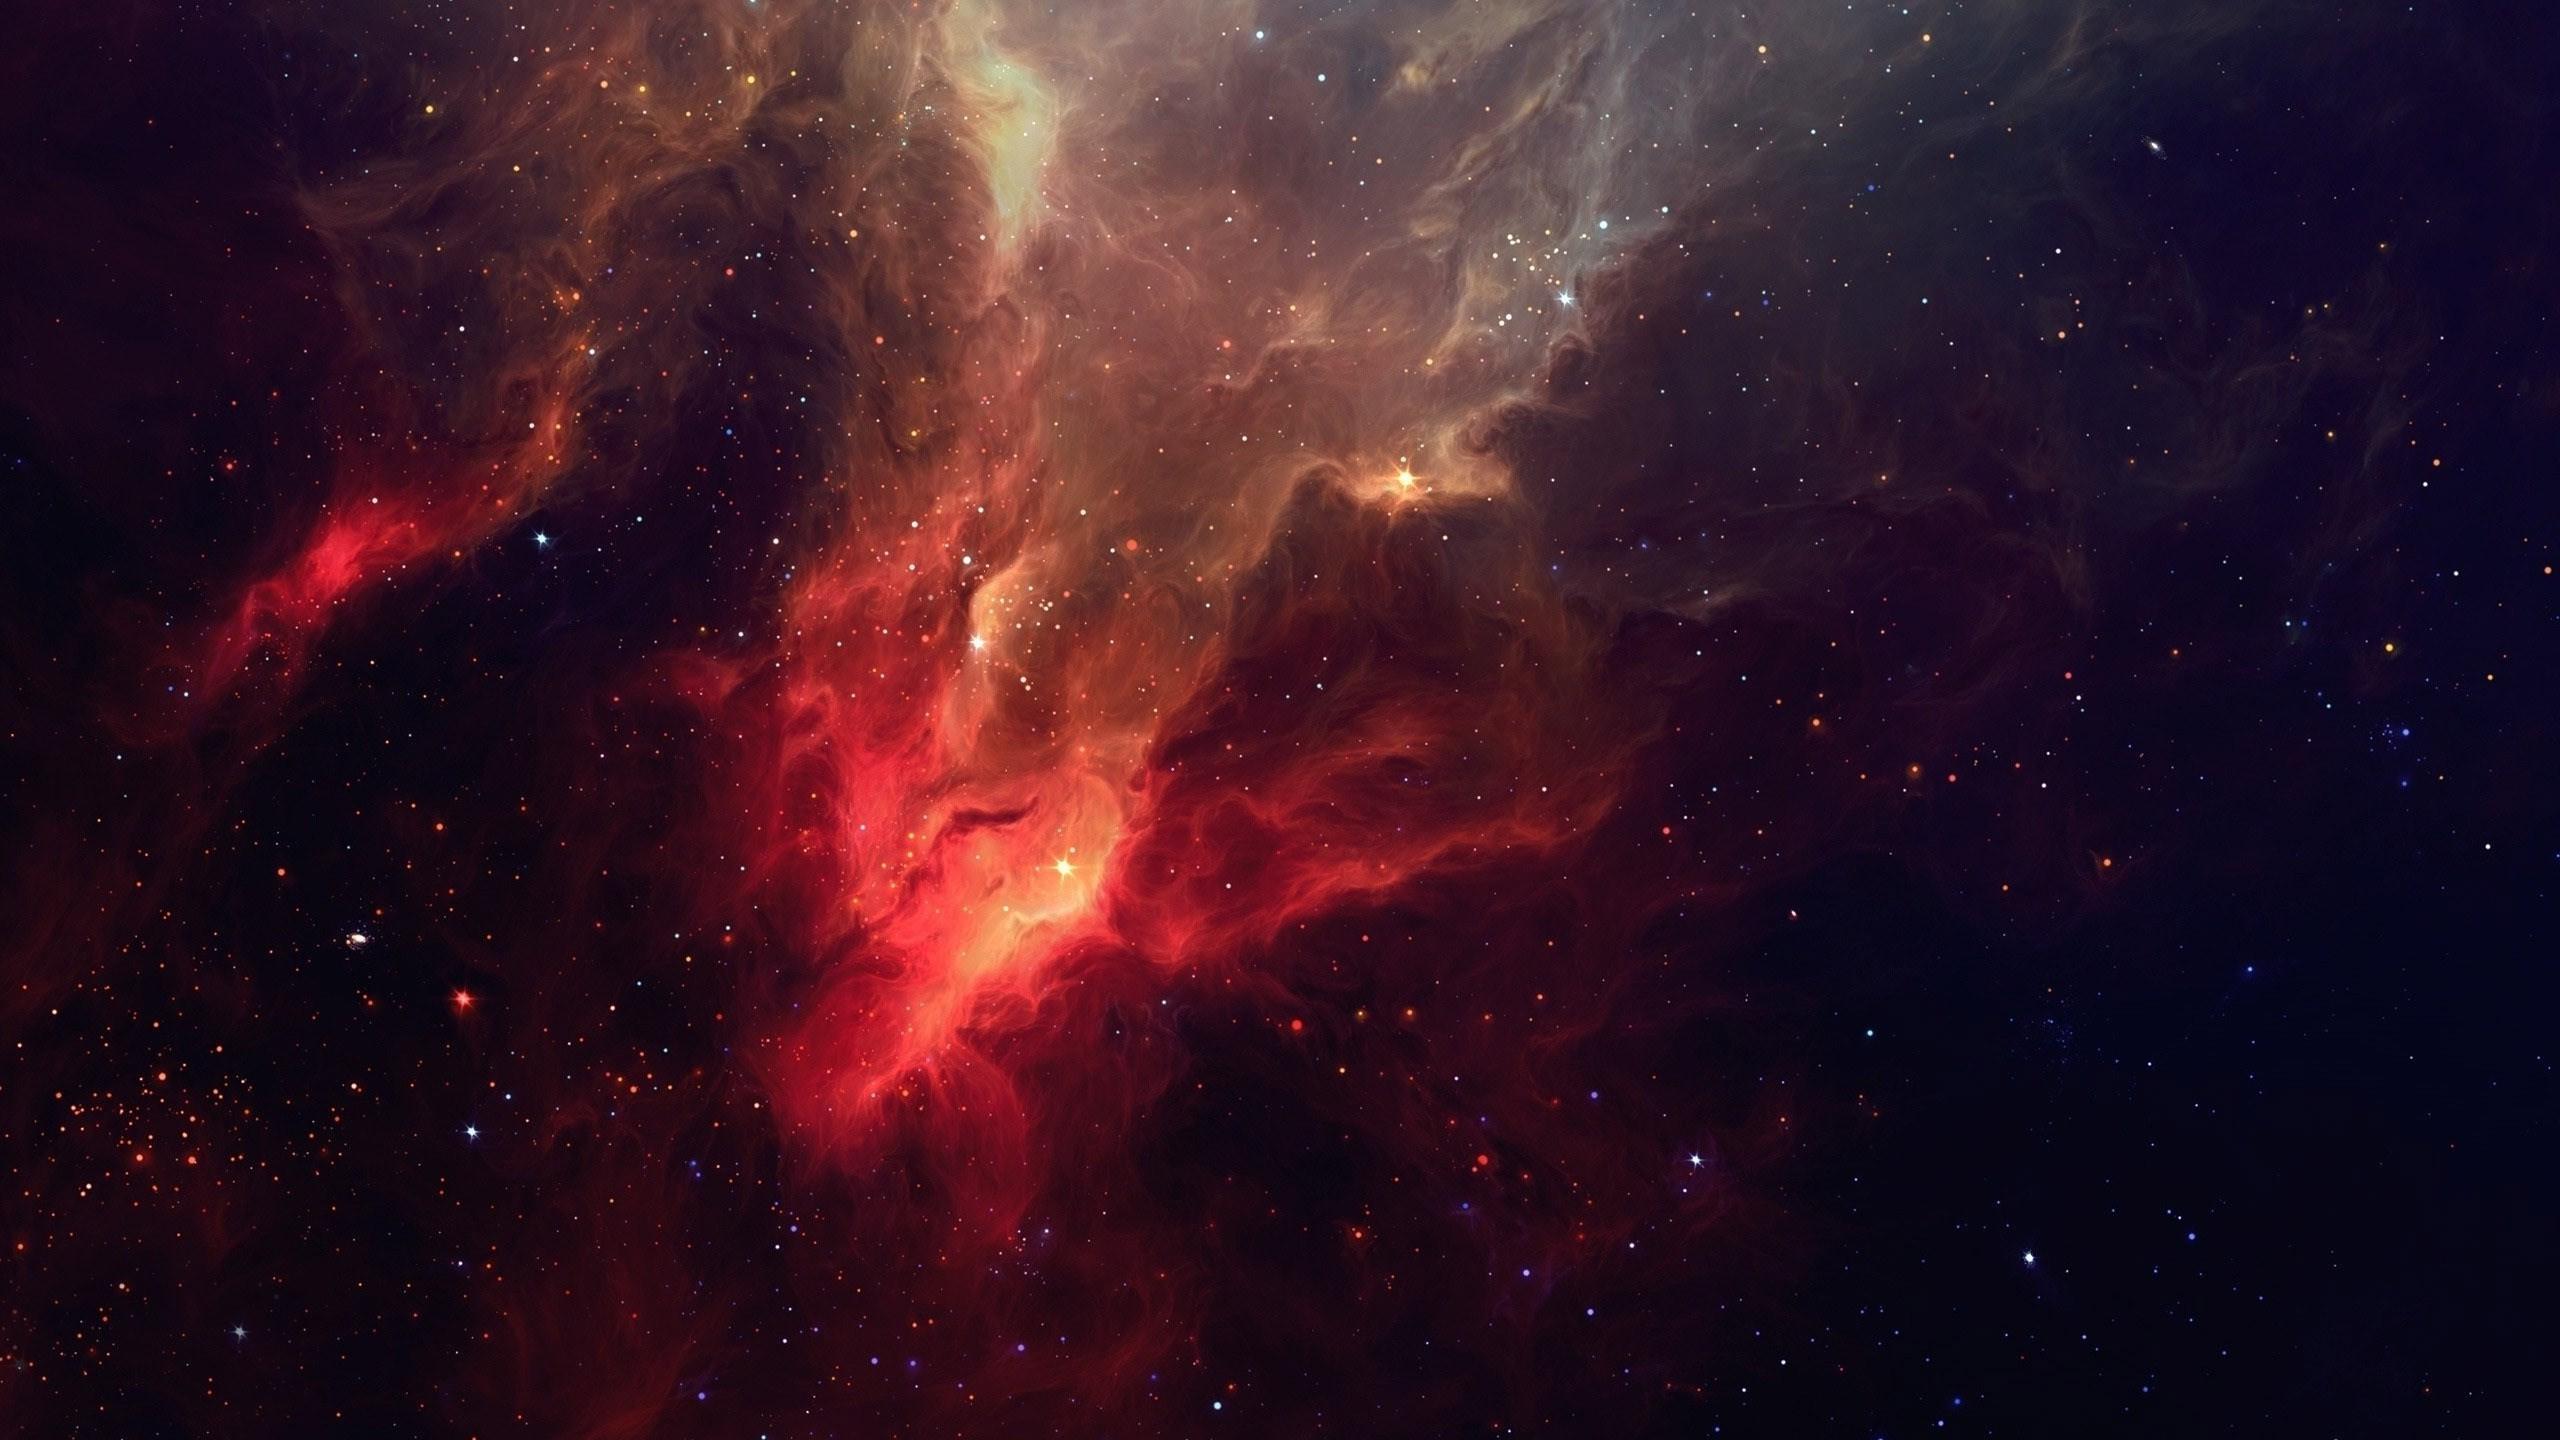 red nebula space hd wallpaper | ololoshenka | Pinterest |  Wallpapers, Red and Nebulas